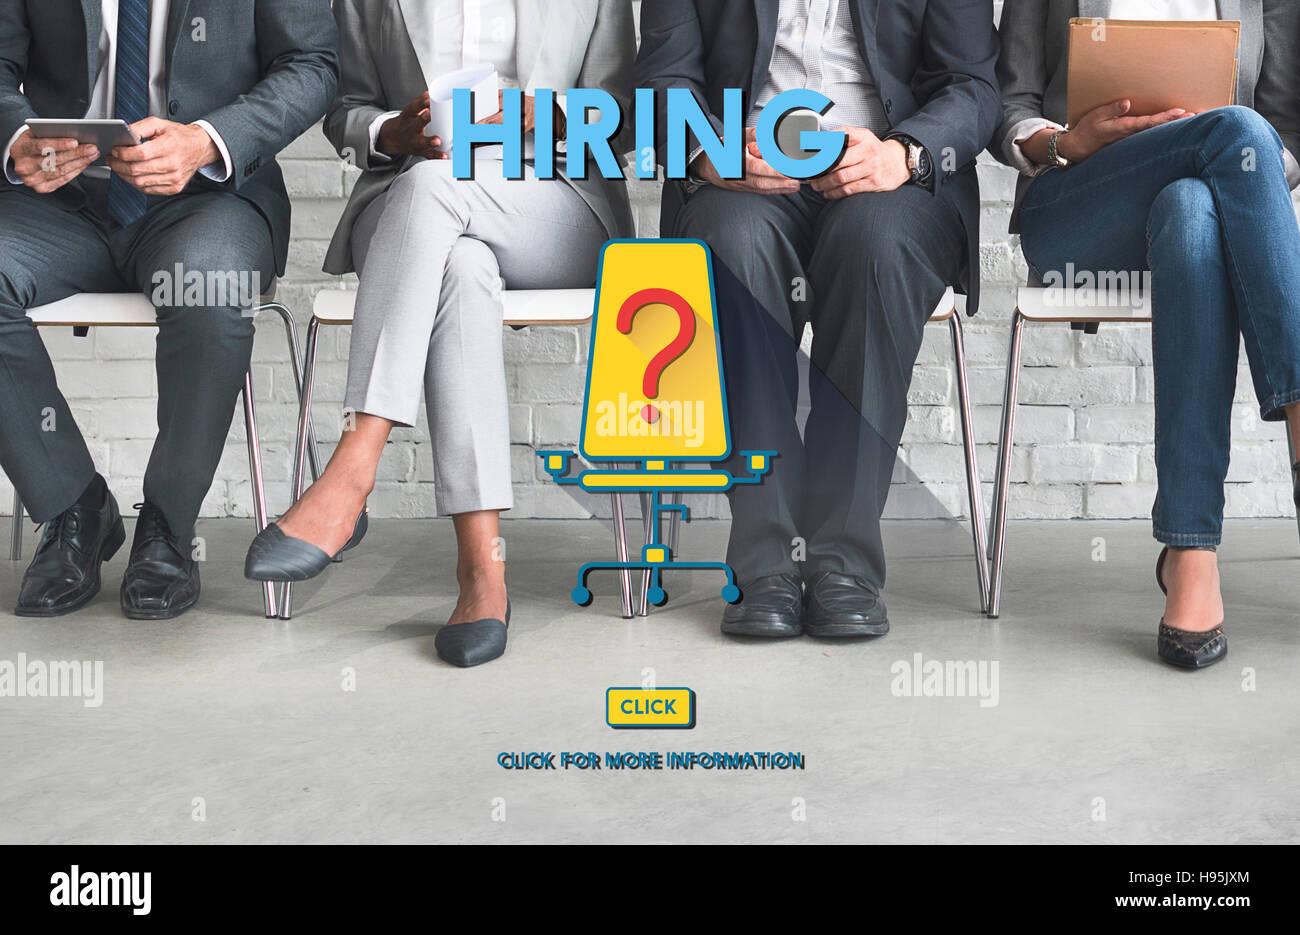 hiring human resources career plan concept stock photo royalty hiring human resources career plan concept